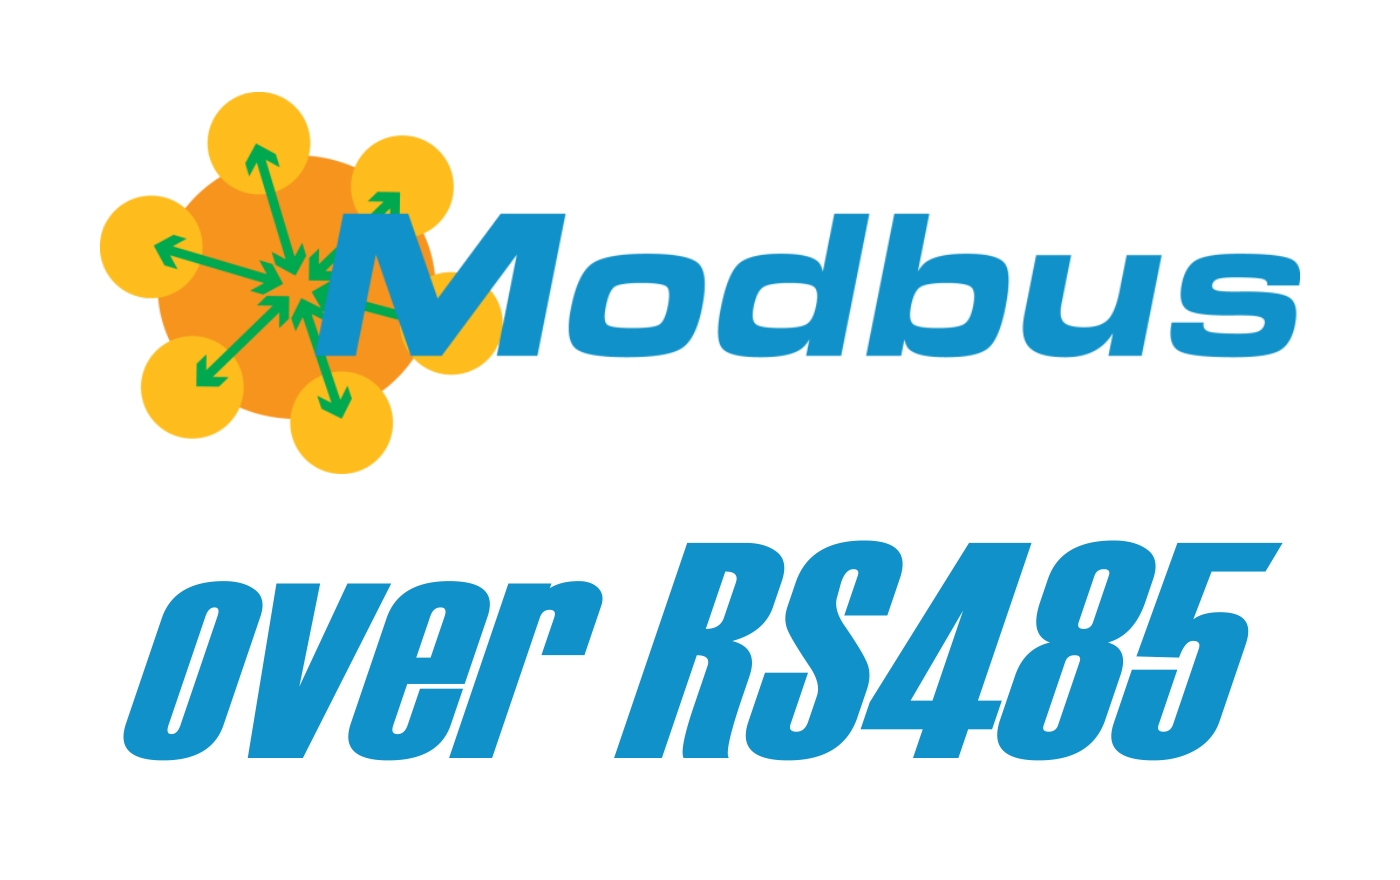 RS485 modbus protocol